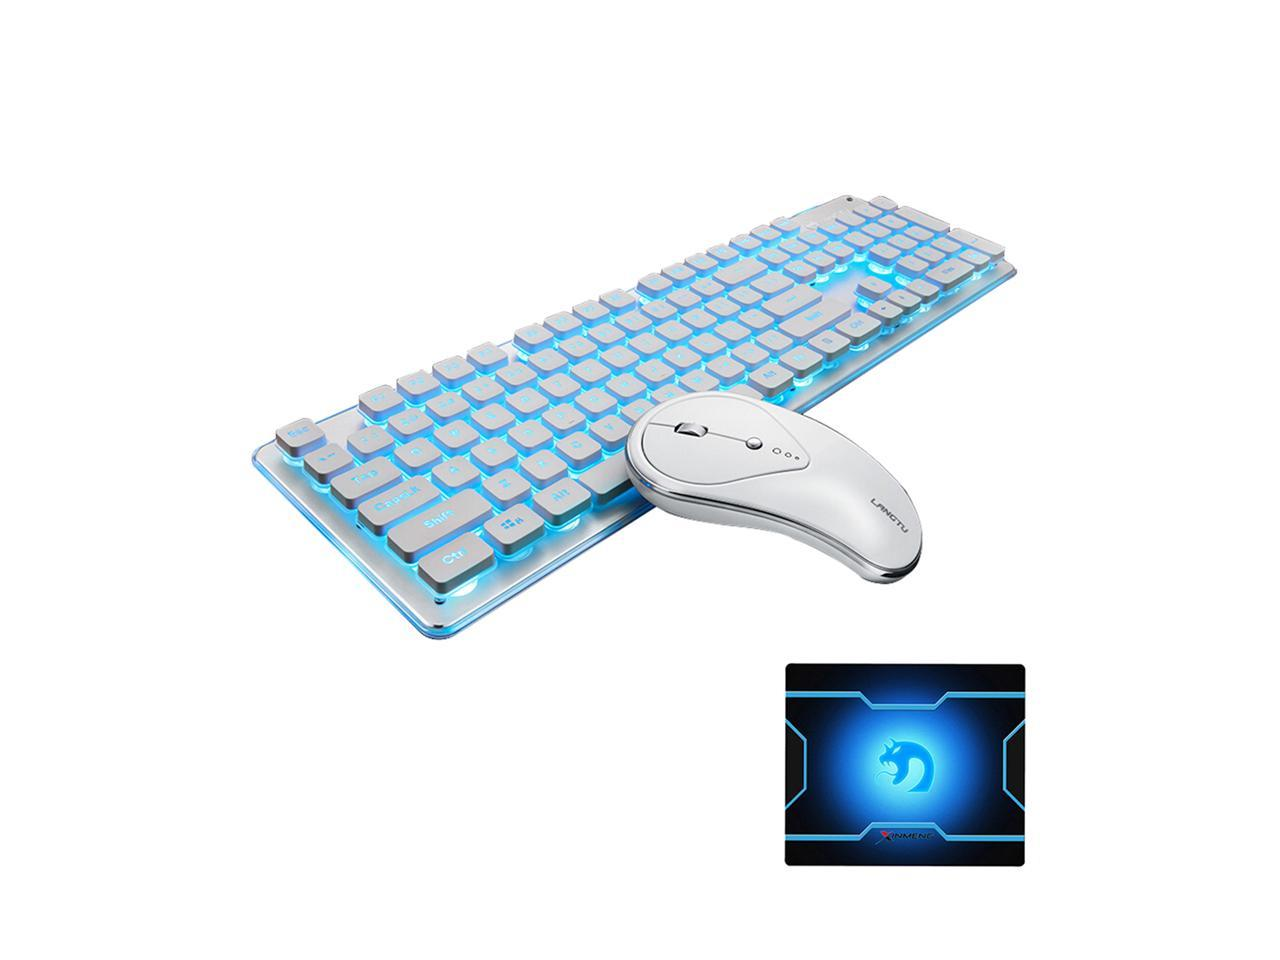 Desktop Color : Green Laptop Ultra Slim Full Size Ergonomic PC Notebook Wireless Keyboard /& MouseSet Combo for Computer